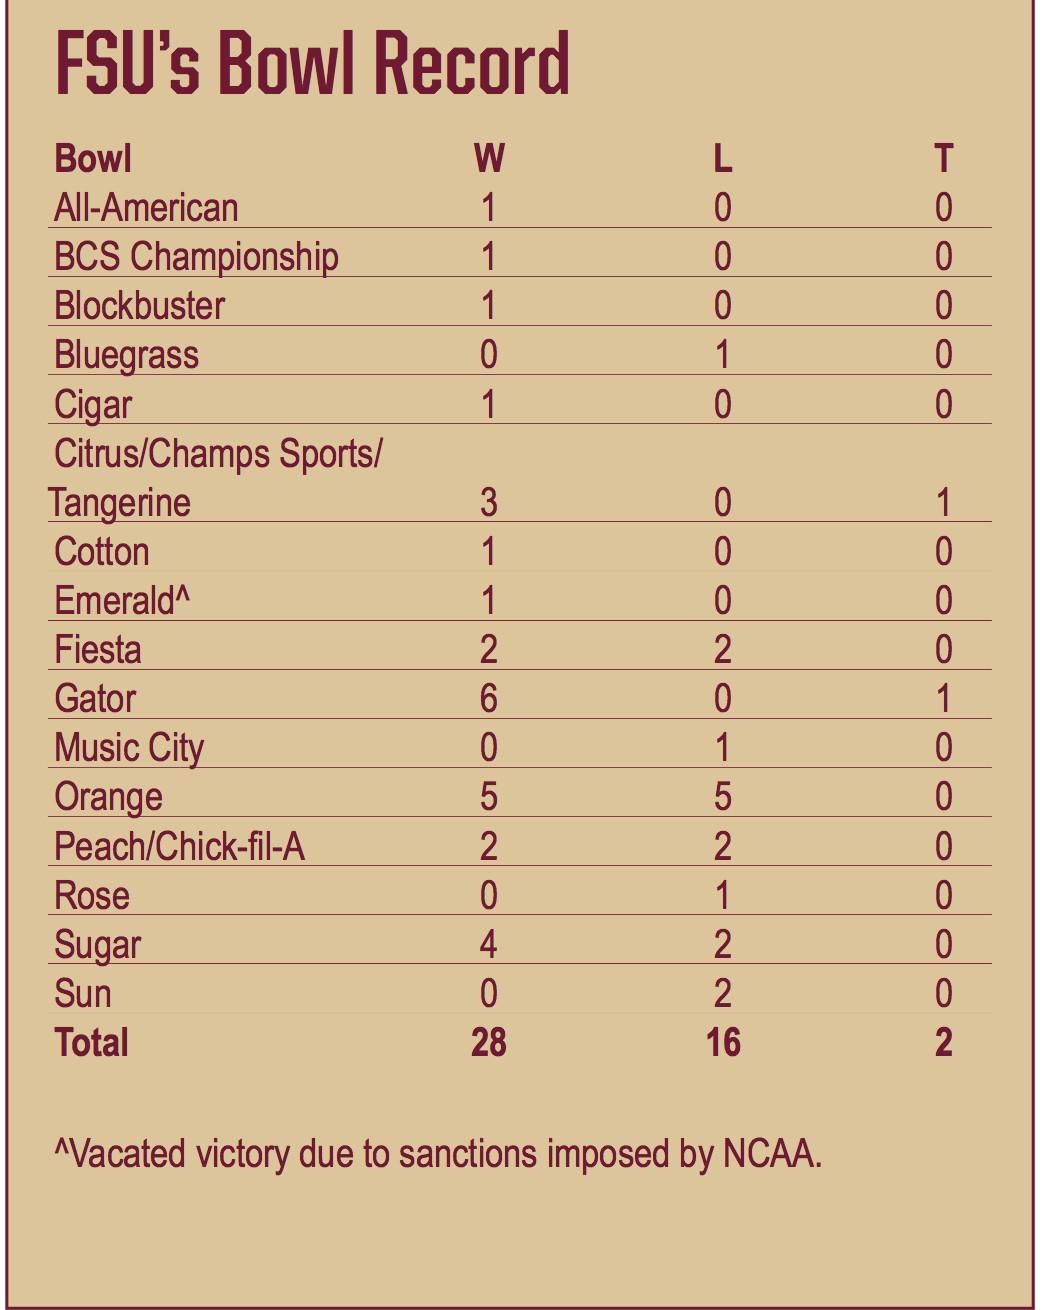 Longest Bowl Streak Fsu Has New Record No Matter What Ncaa Says